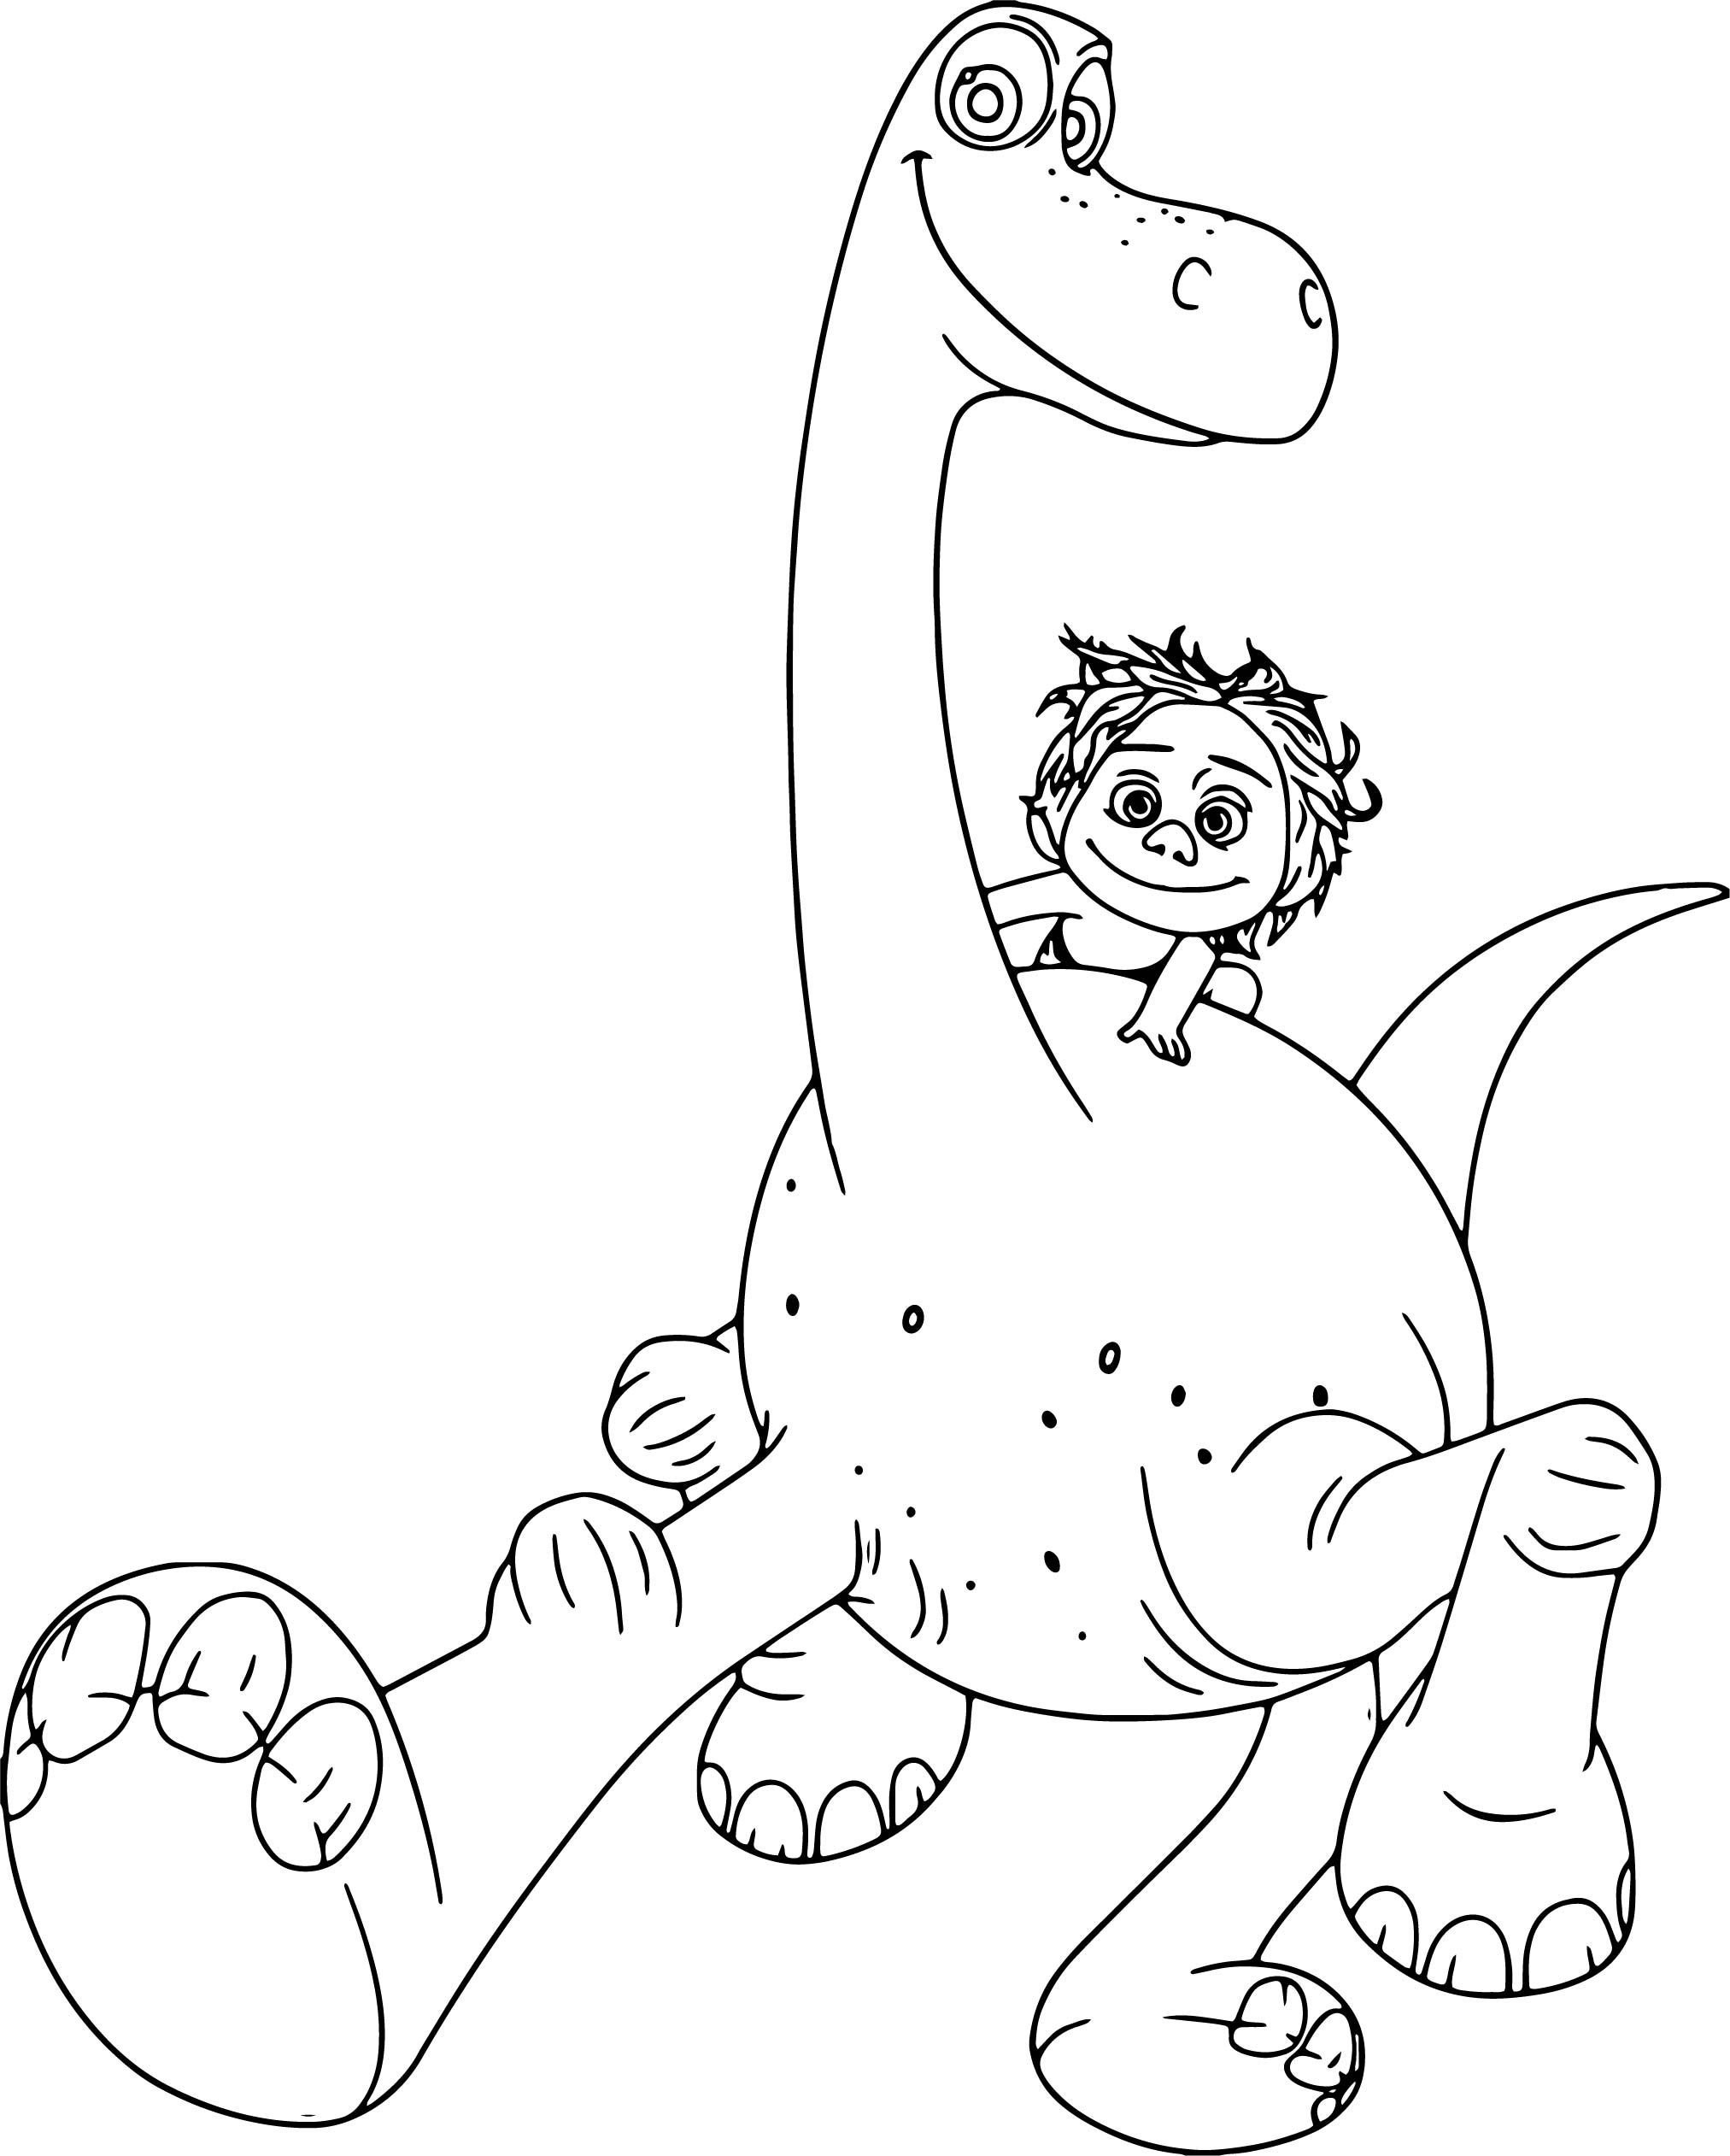 Awesome The Good Dinosaur Disney Arlo Spot With Cartoon Coloring Pages Dinosaur Coloring Pages Cartoon Coloring Pages Dinosaur Coloring